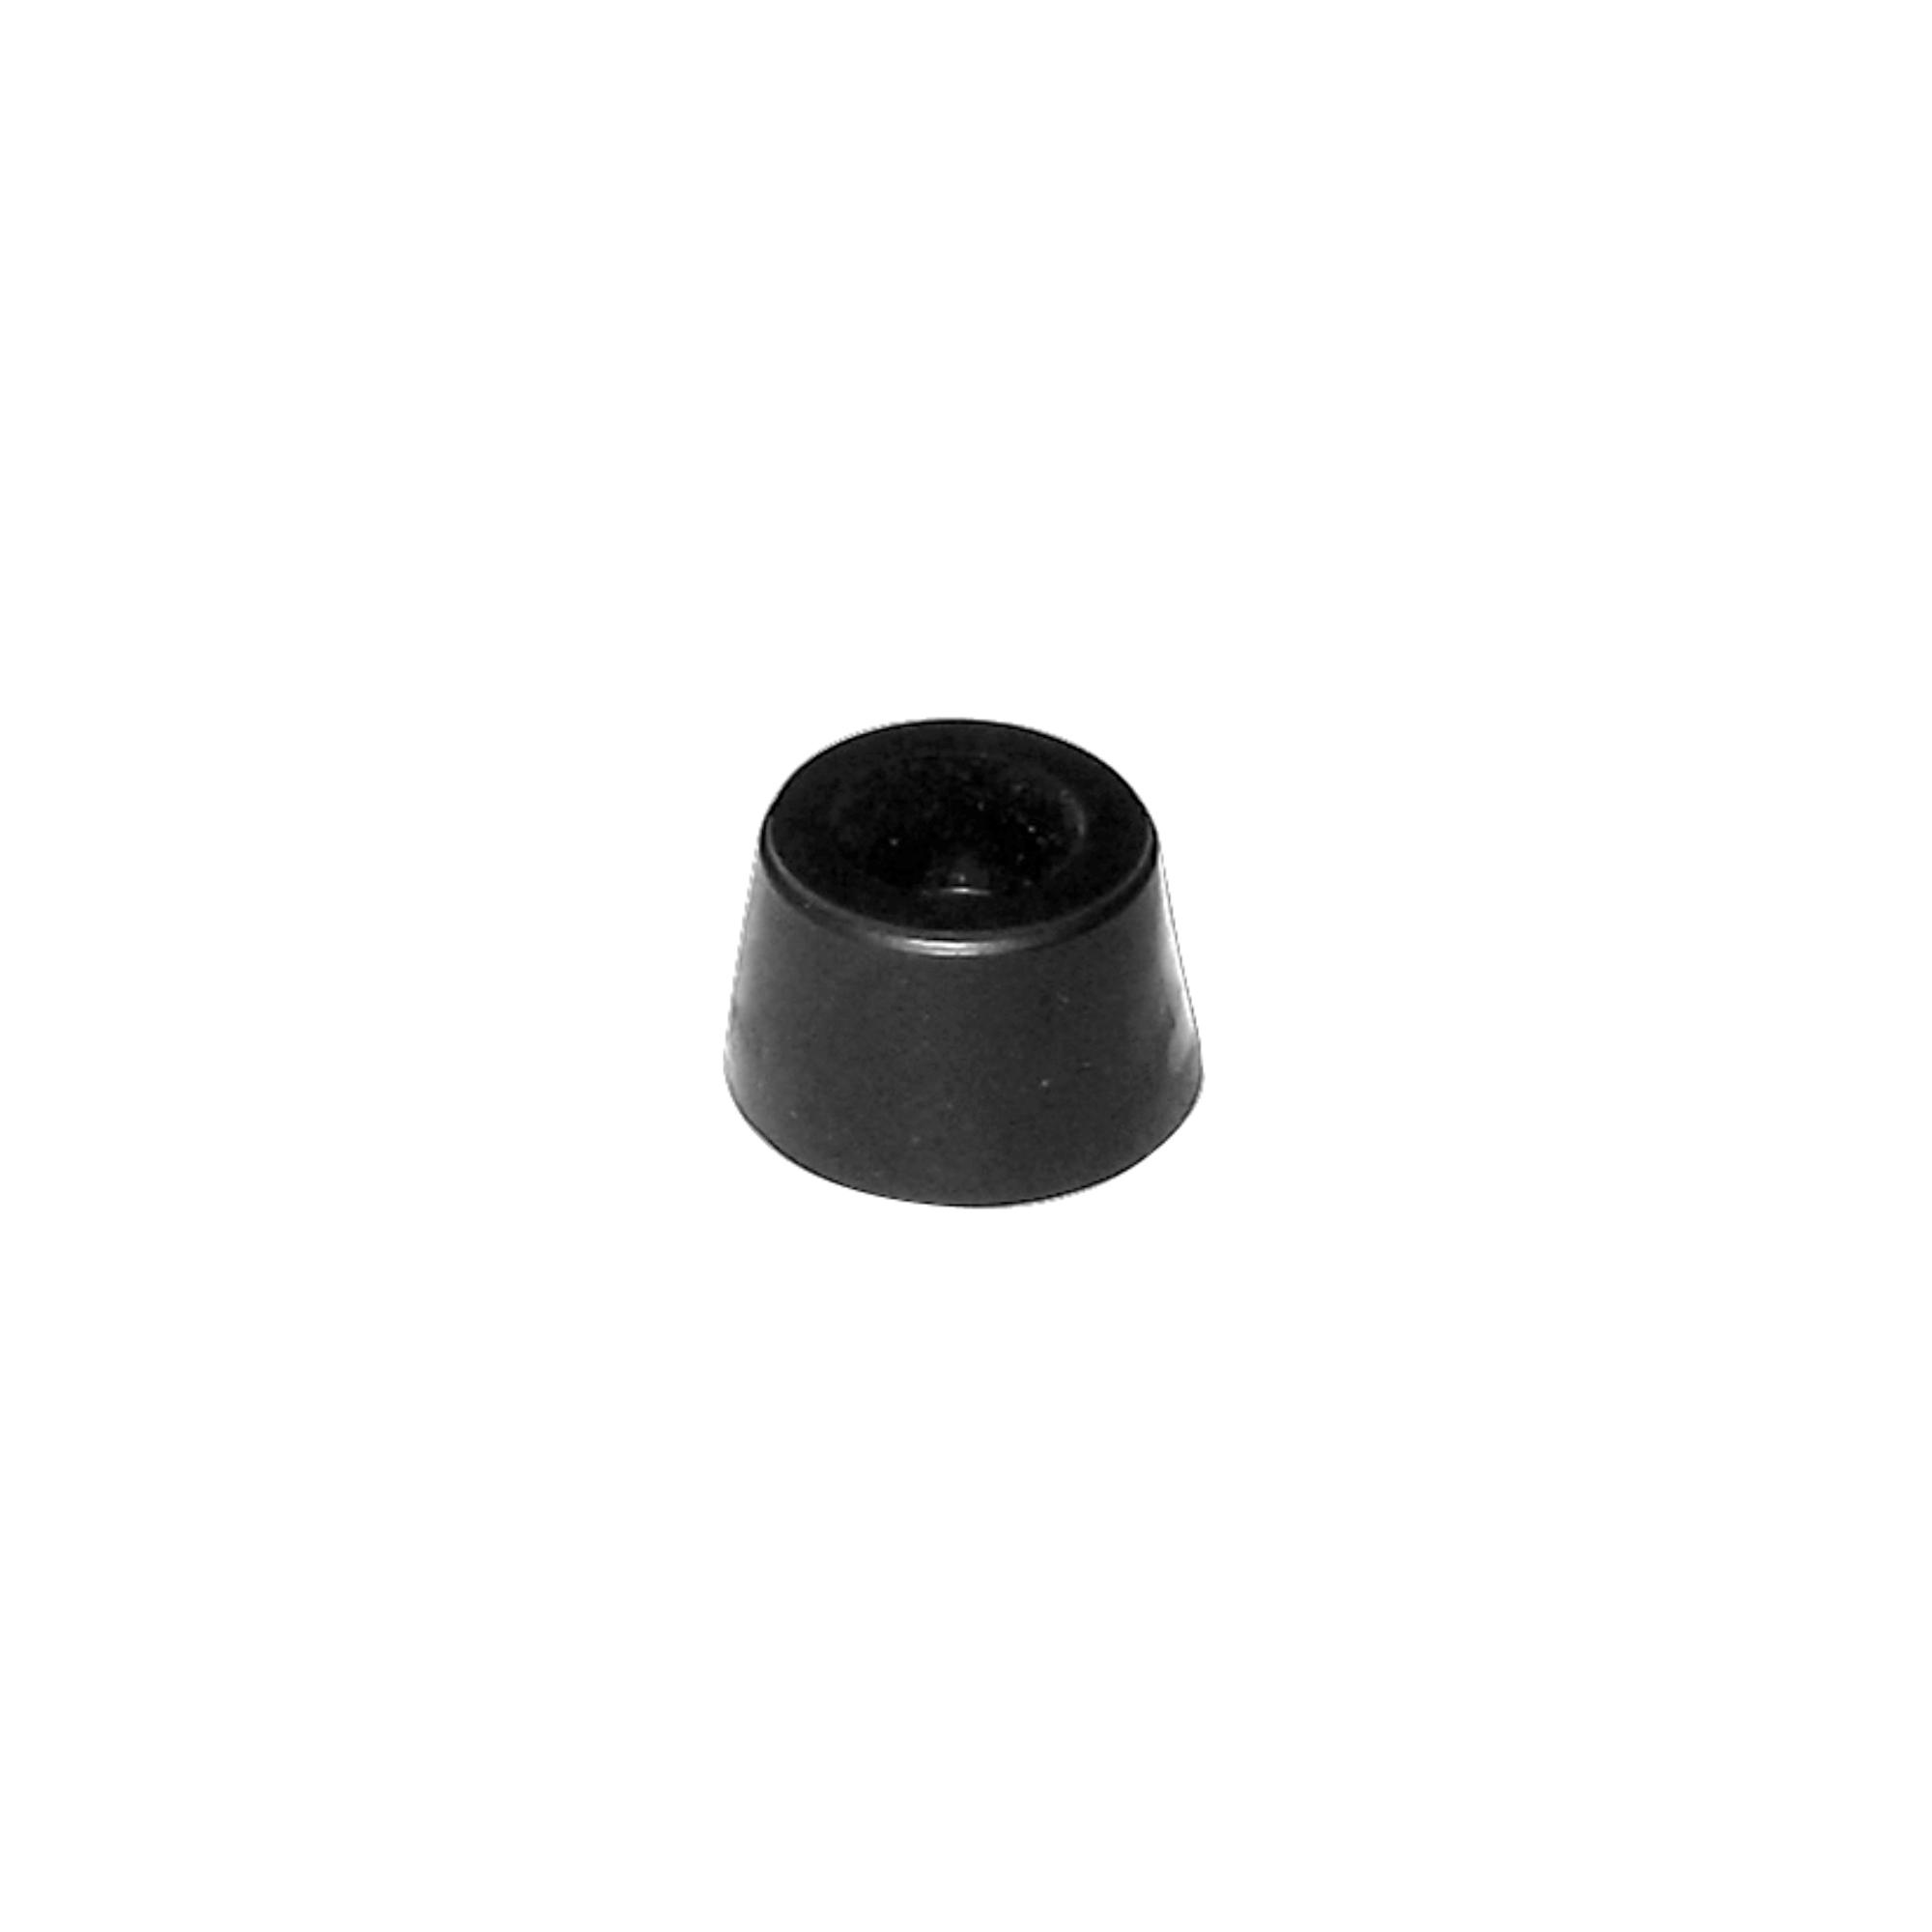 Batente PVC Pequeno Cônico Preto